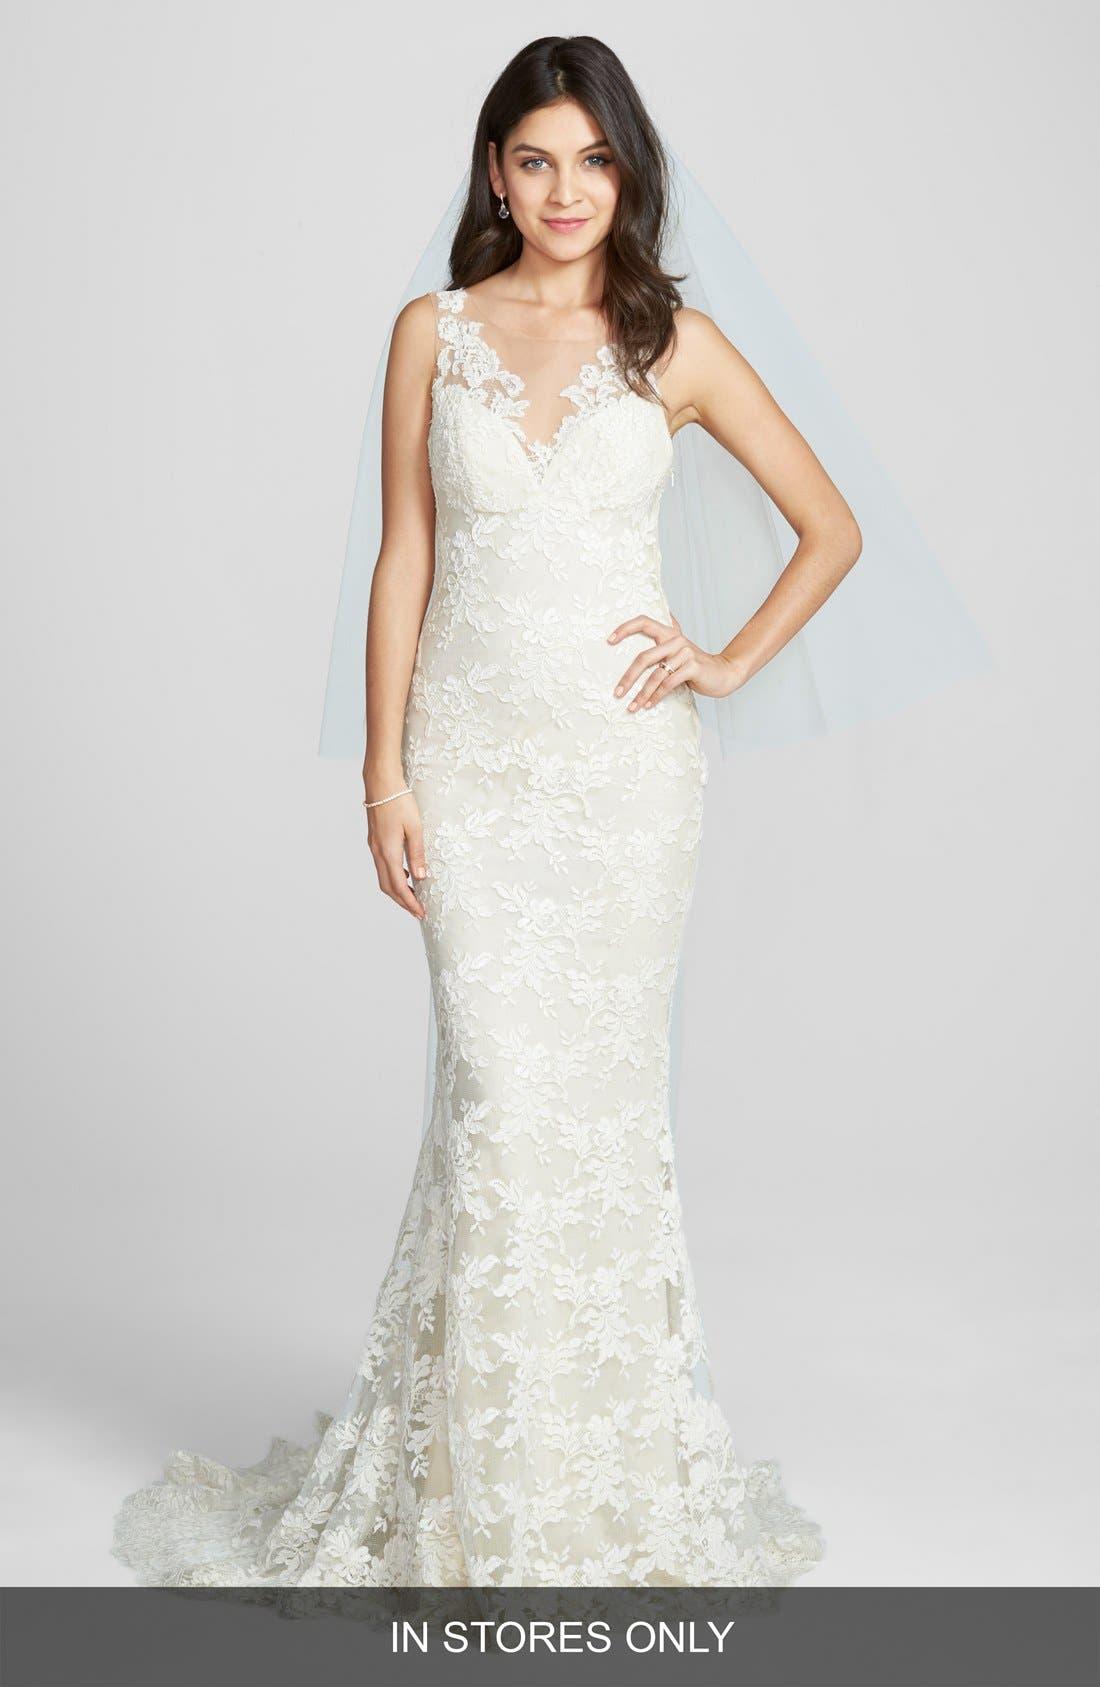 'Nicole' Aleçon Lace Mermaid Dress,                         Main,                         color, IVORY/ VANILLA